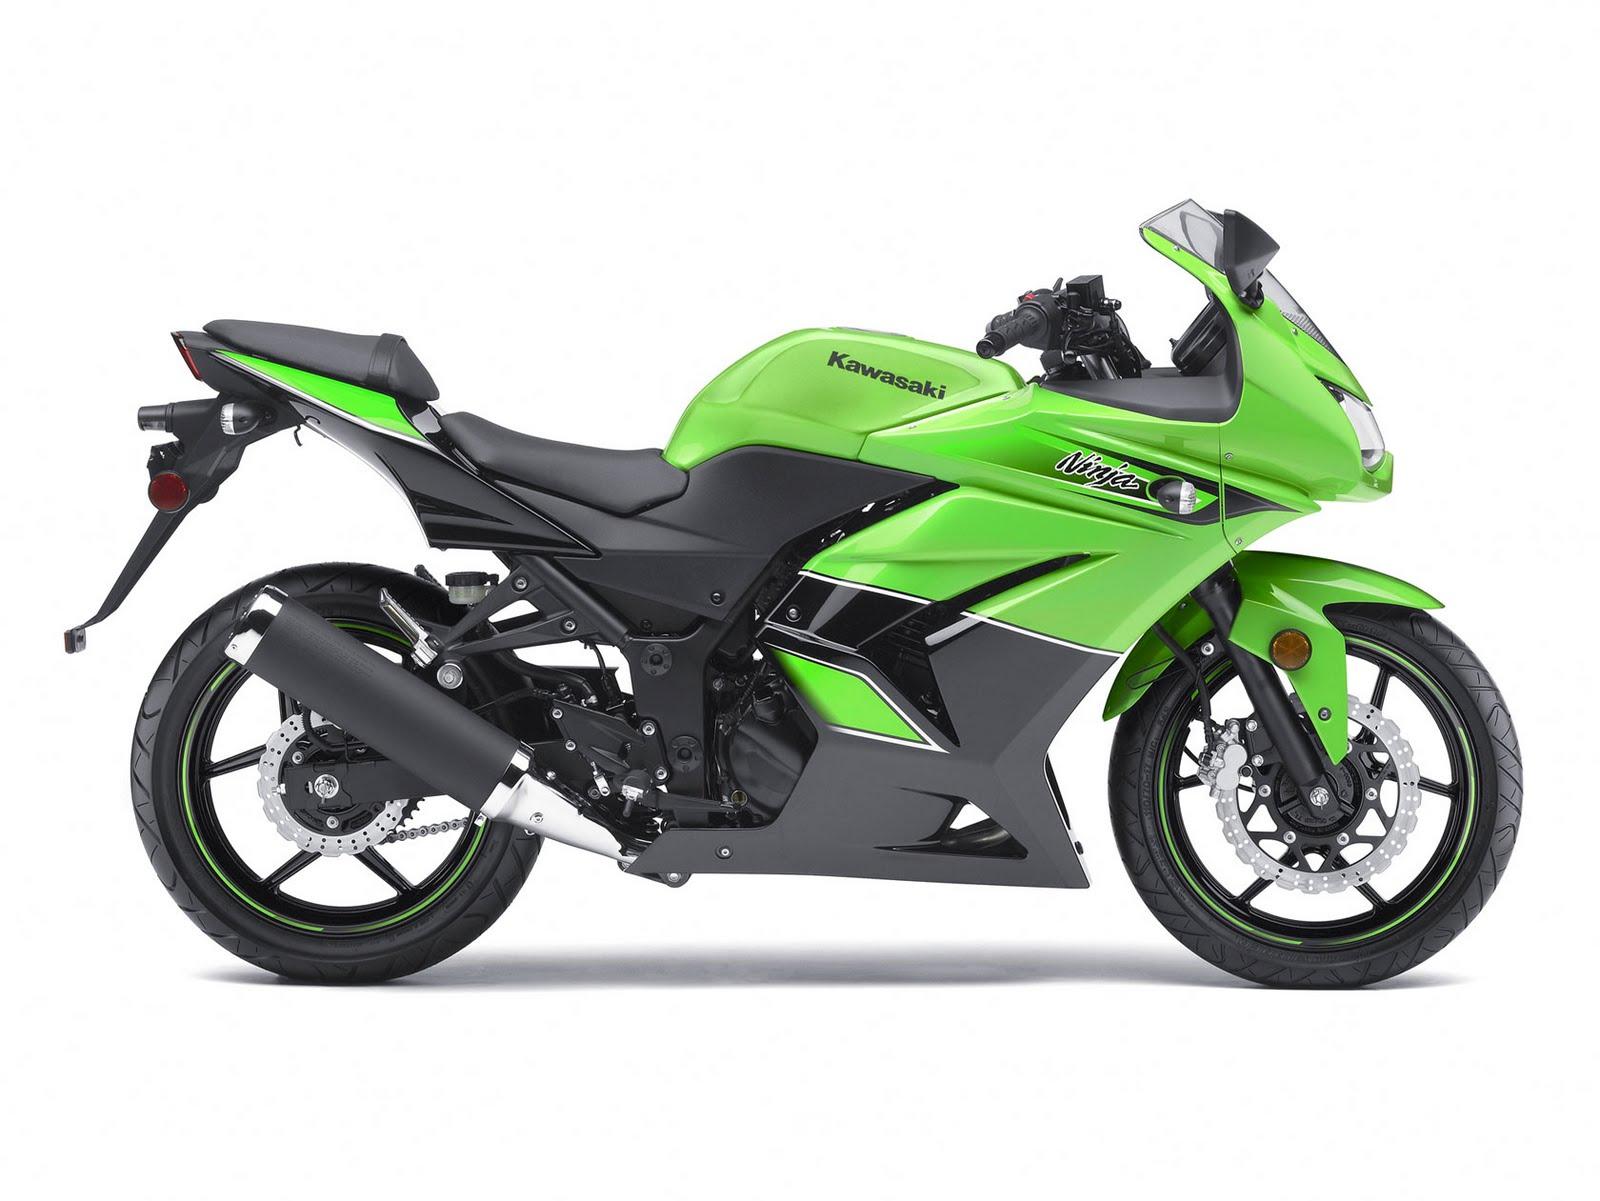 Top Motorcycle Wallpapers: 2011 Kawasaki Ninja 250R Pictures